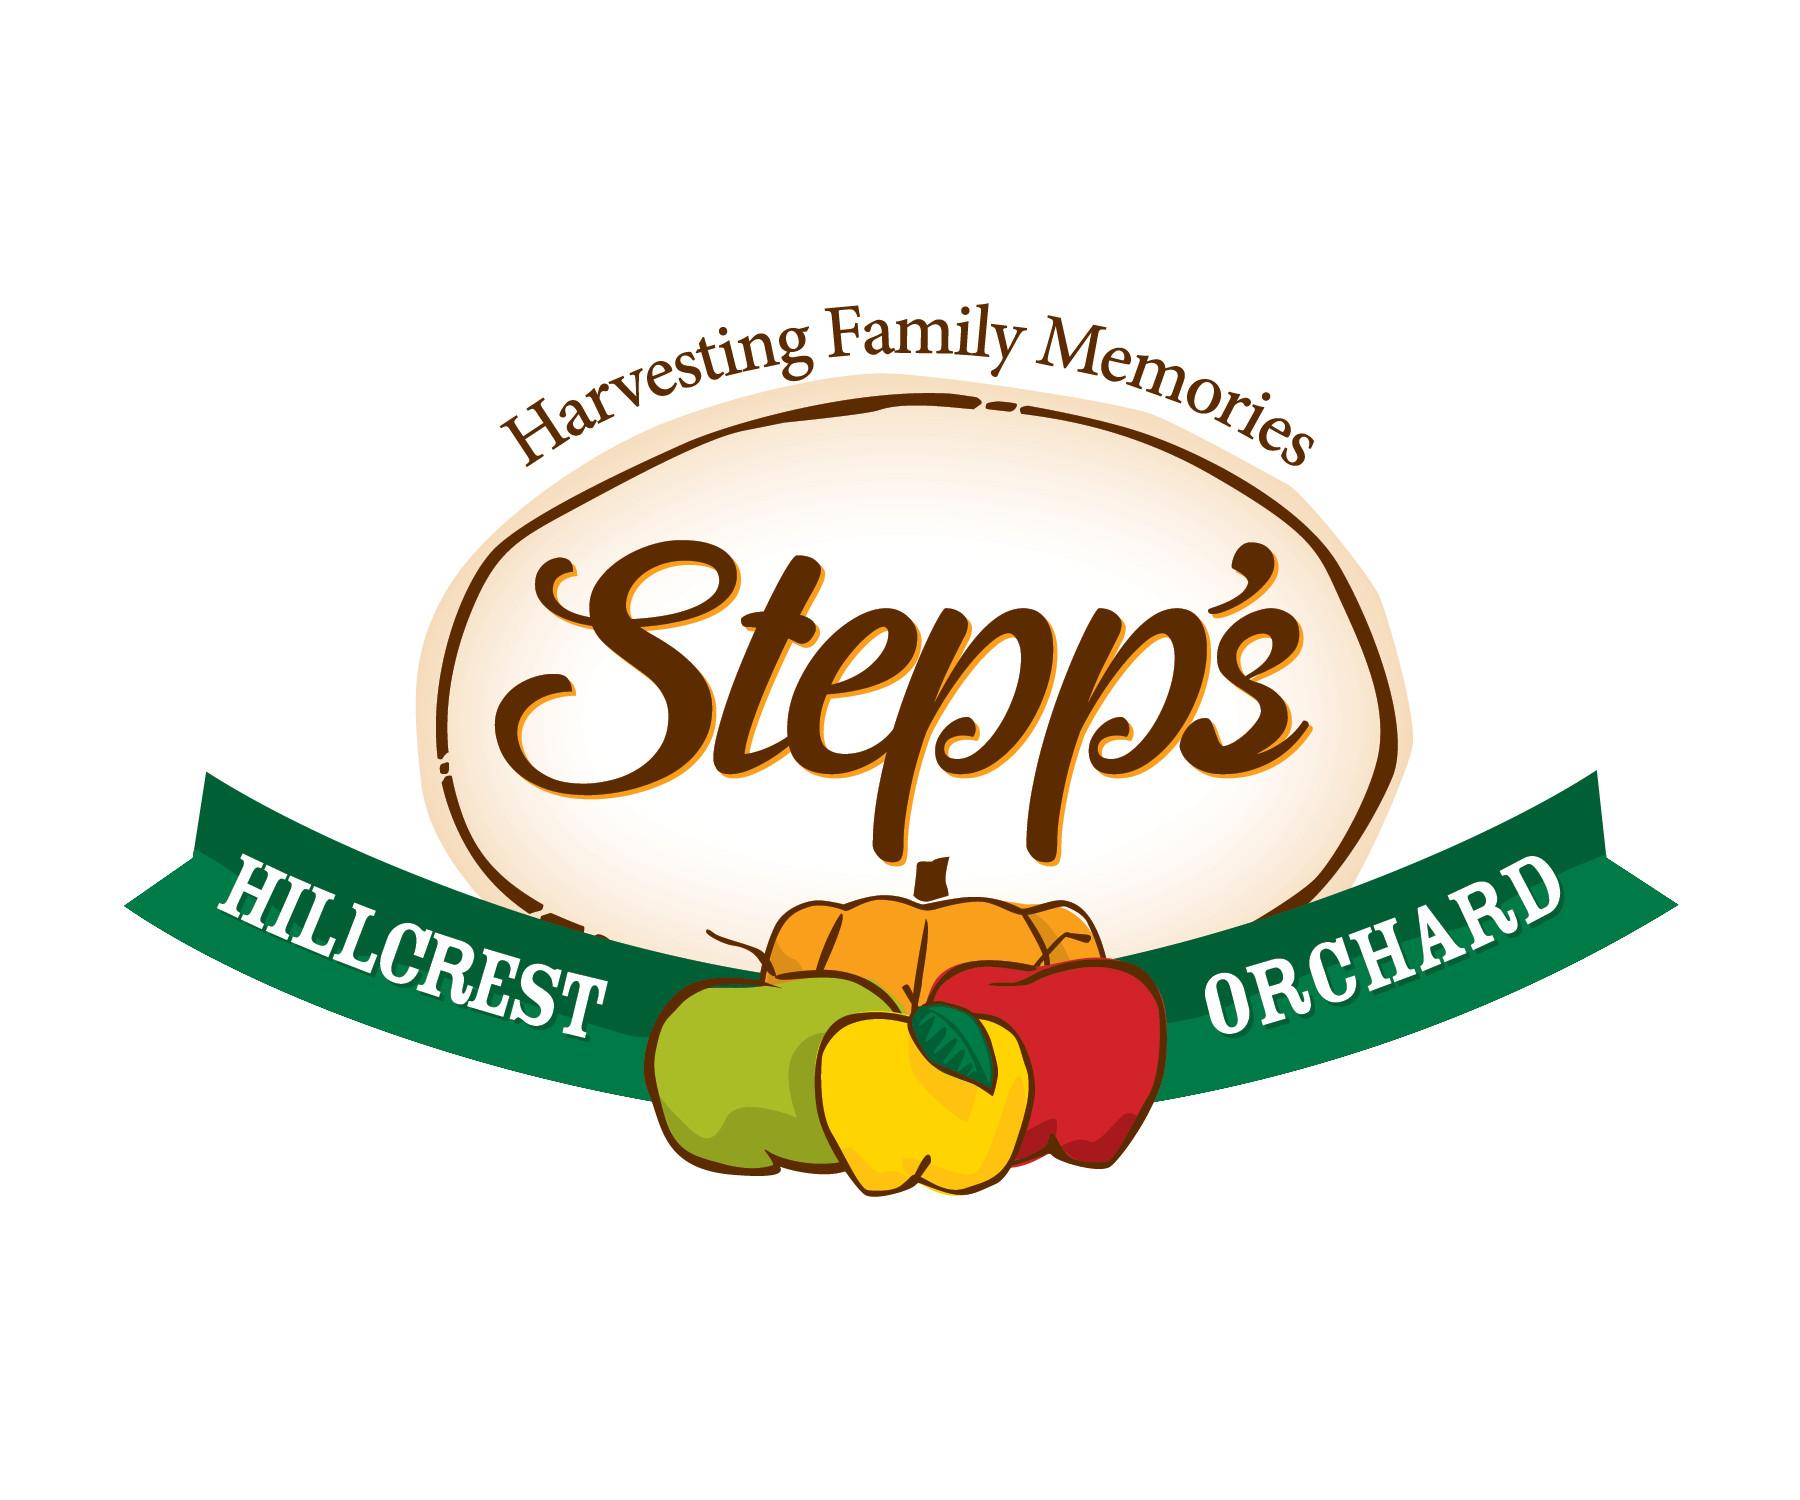 Stepp's Hillcrest Orchard